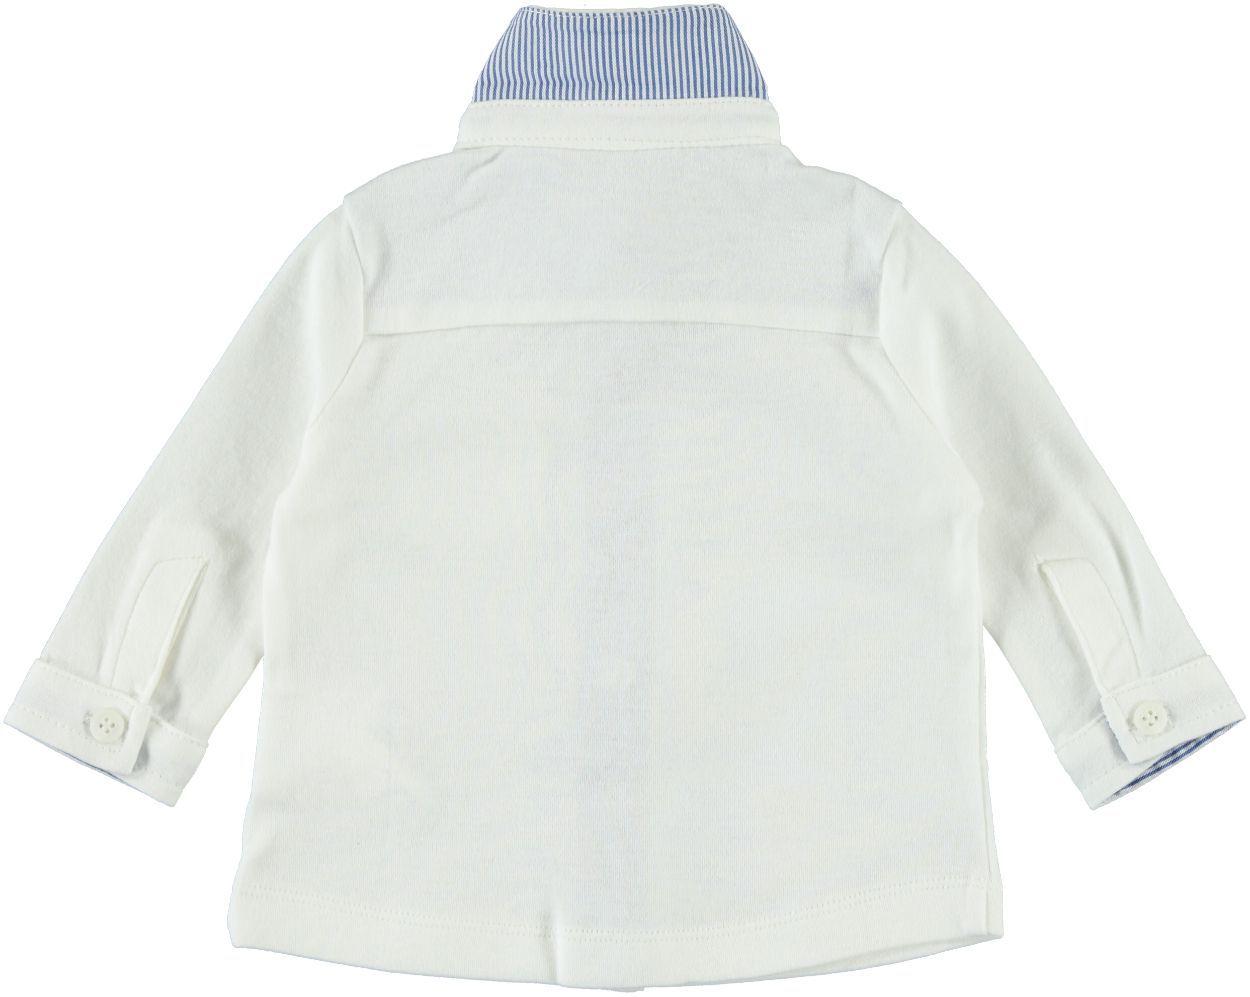 1d8e31dc08 Camicia bianca 100% cotone per bambino da 0 a 18 mesi Minibanda ...